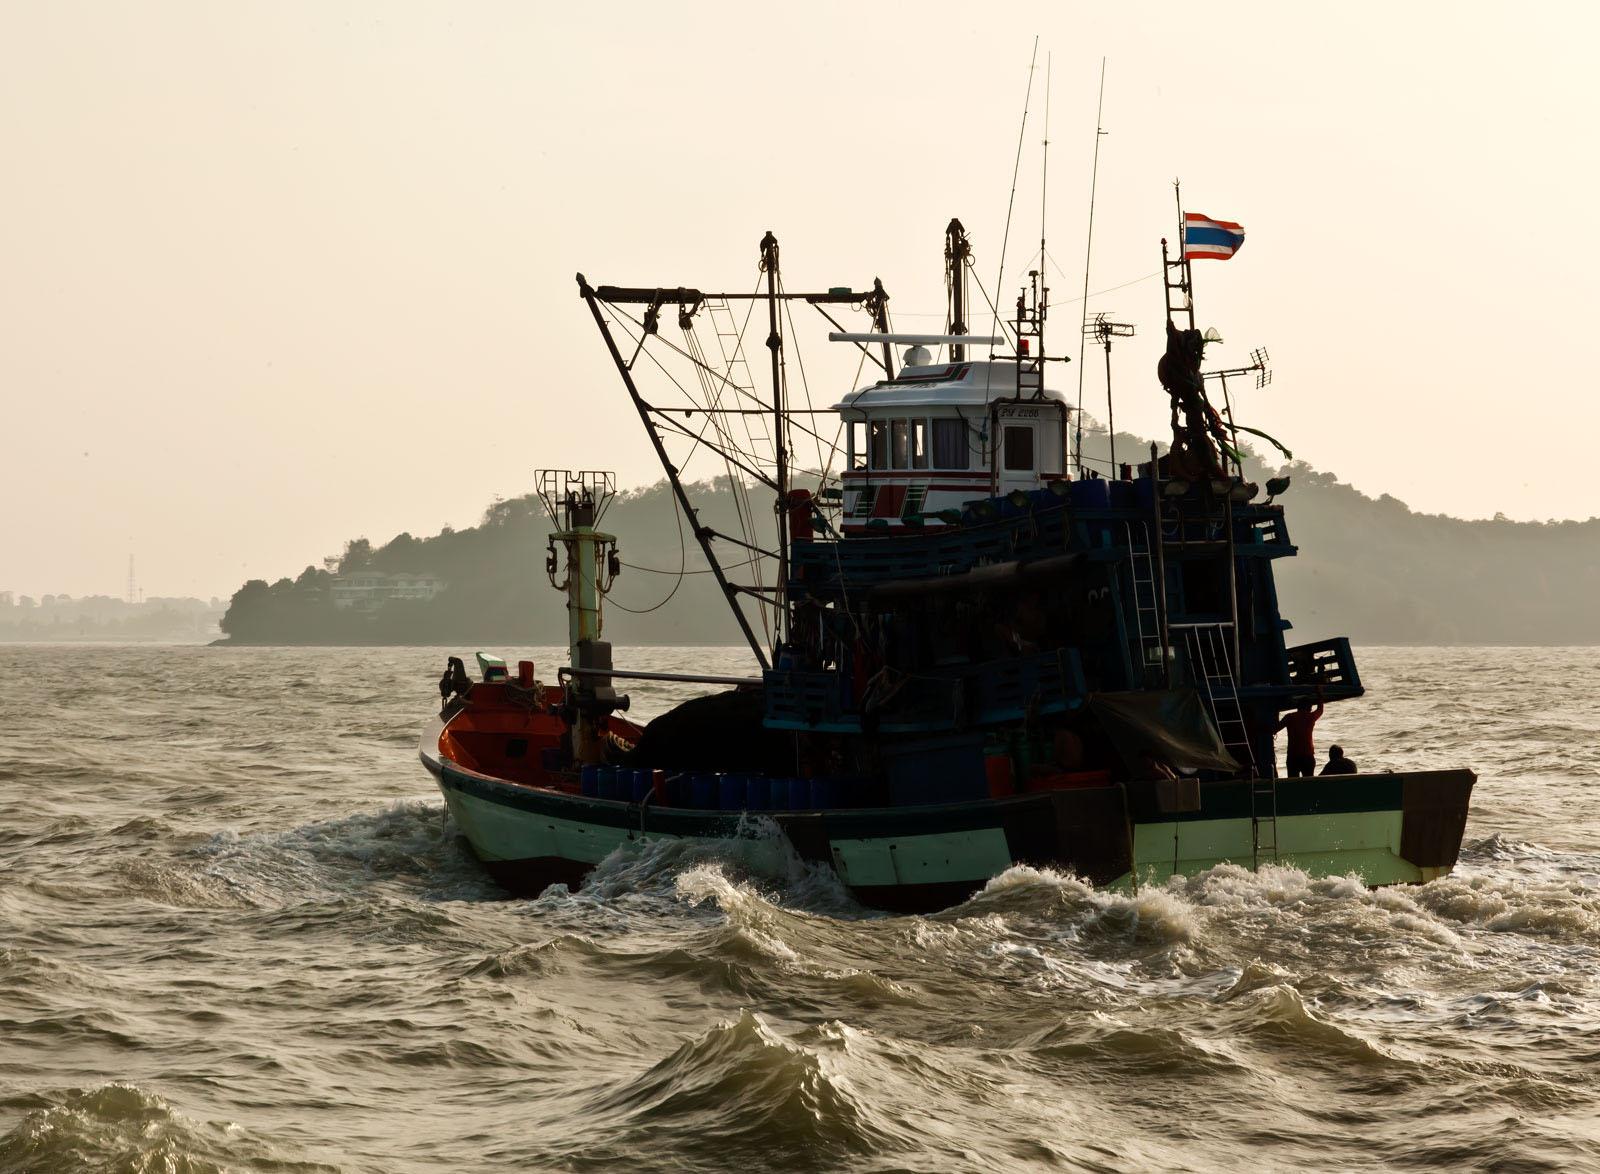 Thai fishing boat PSF 2266 Phuket Province Thailand 01